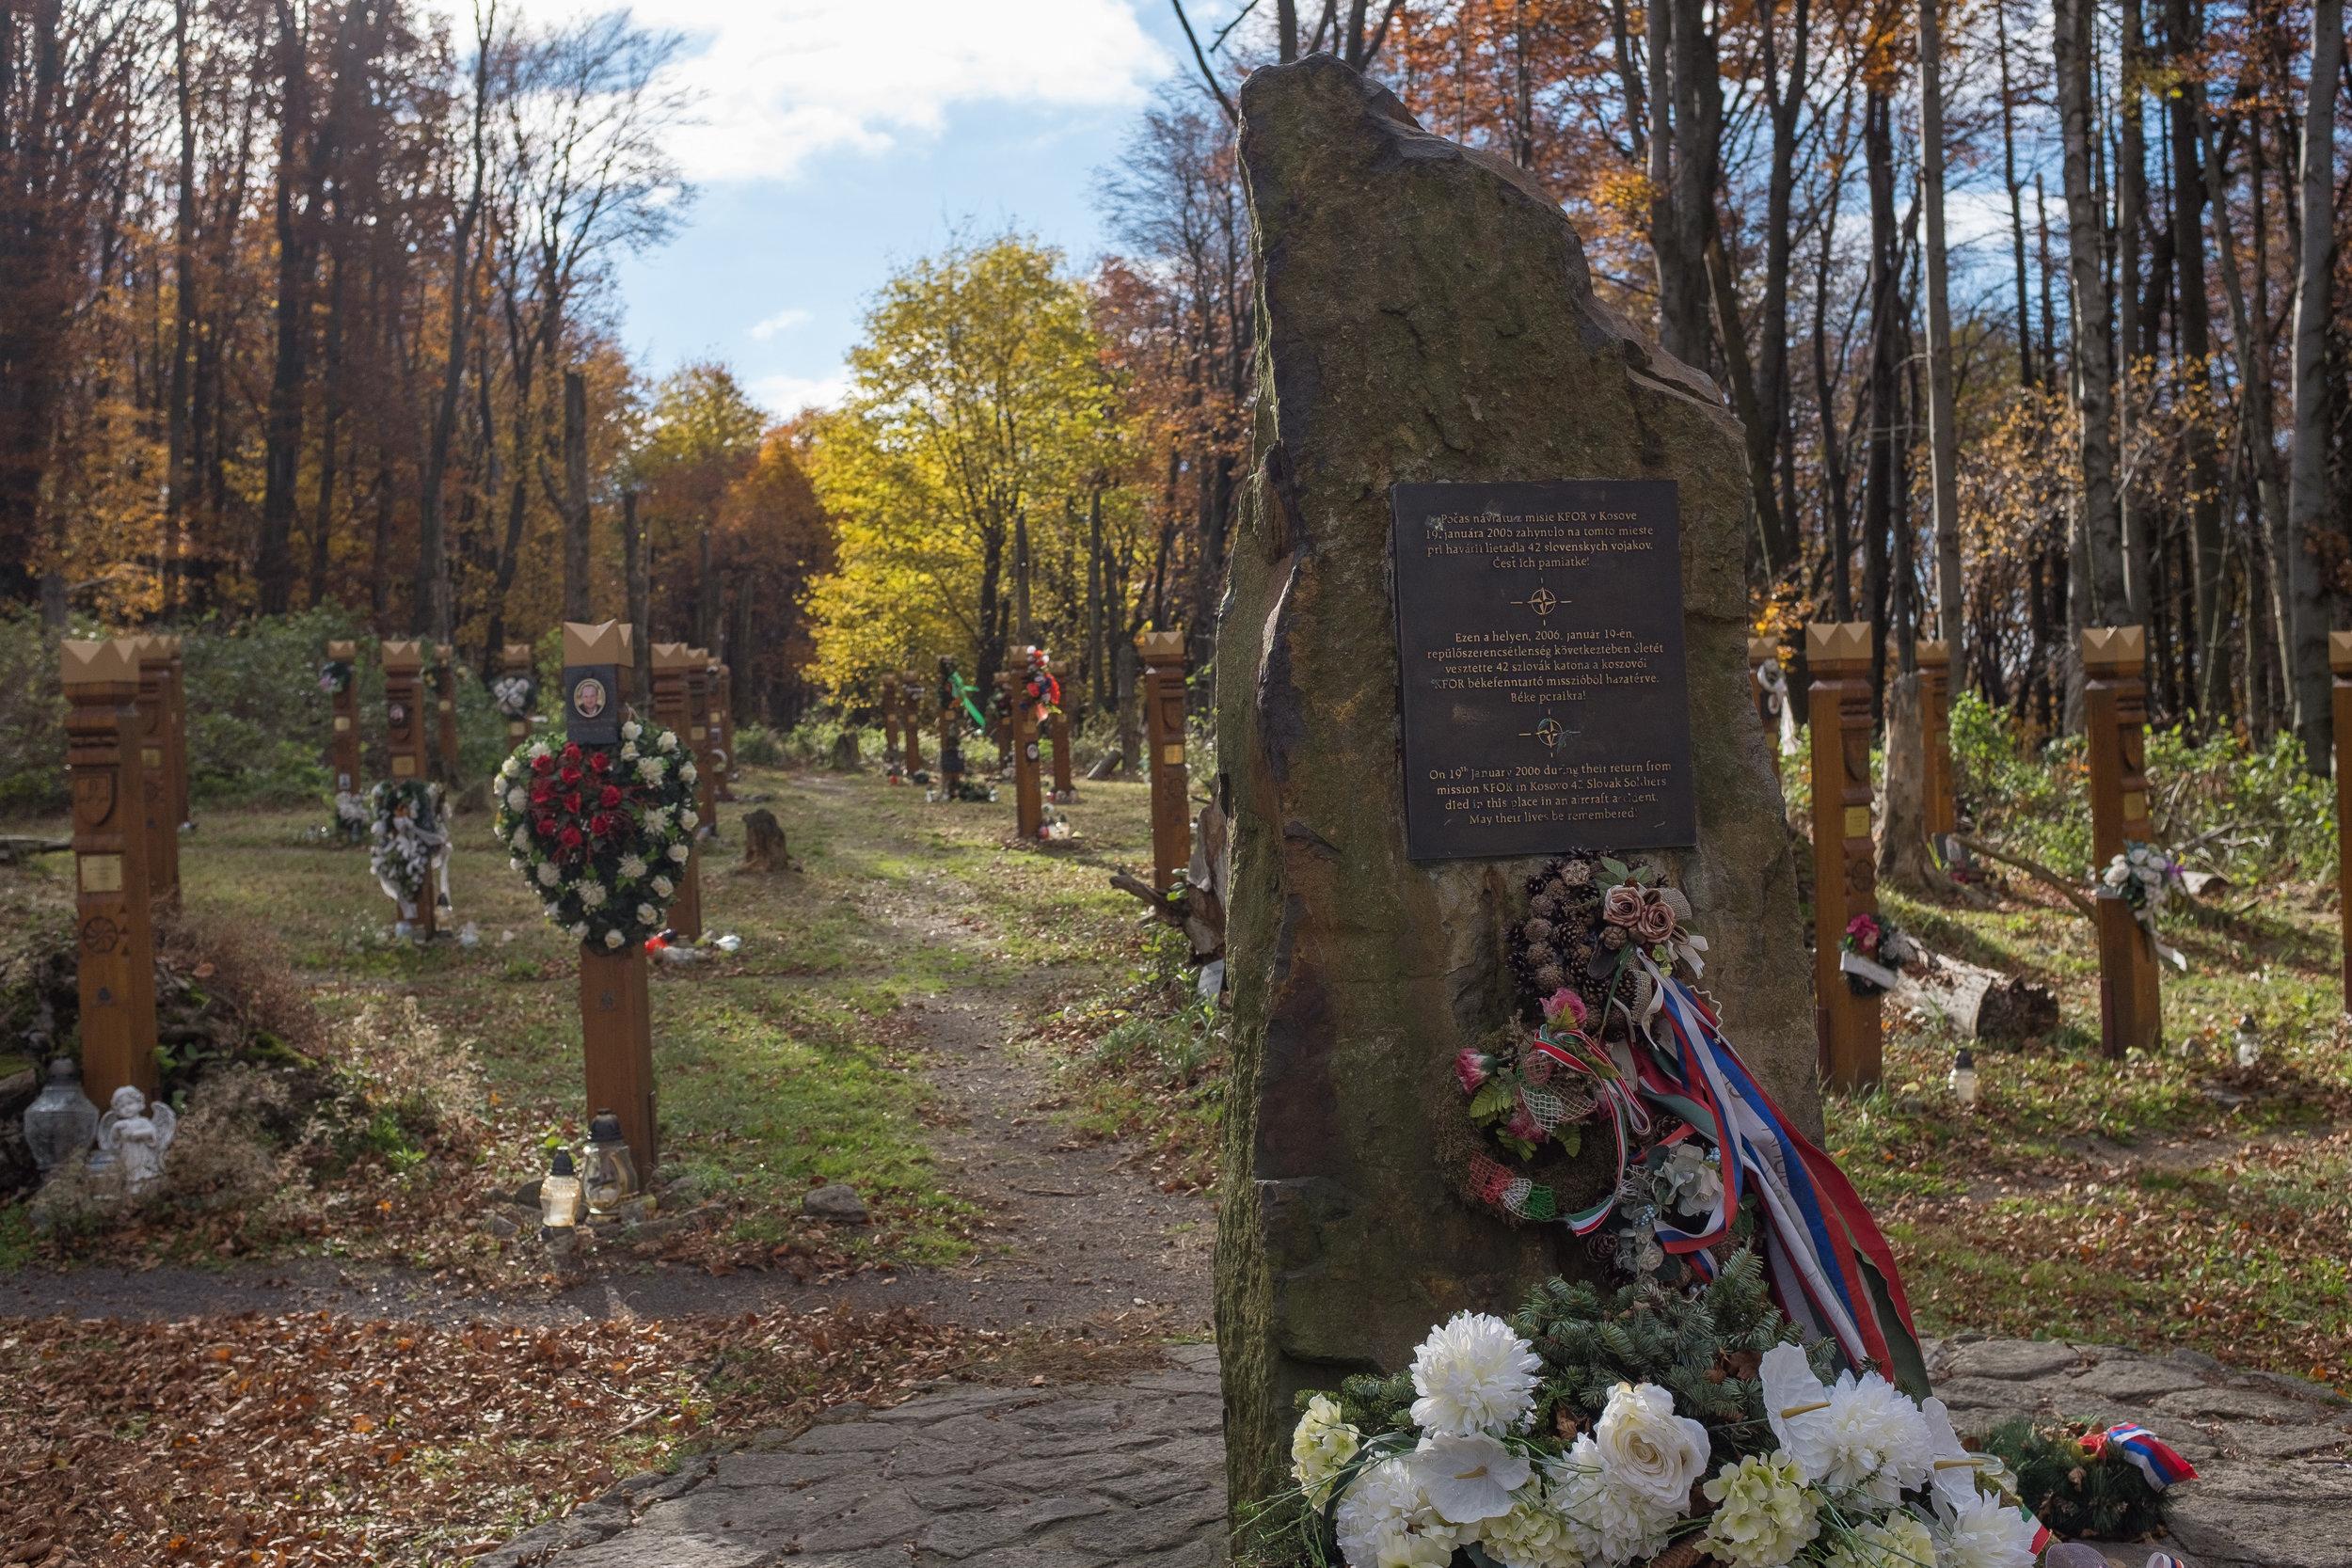 Memorial to the 2006 Slovak military plane crash.